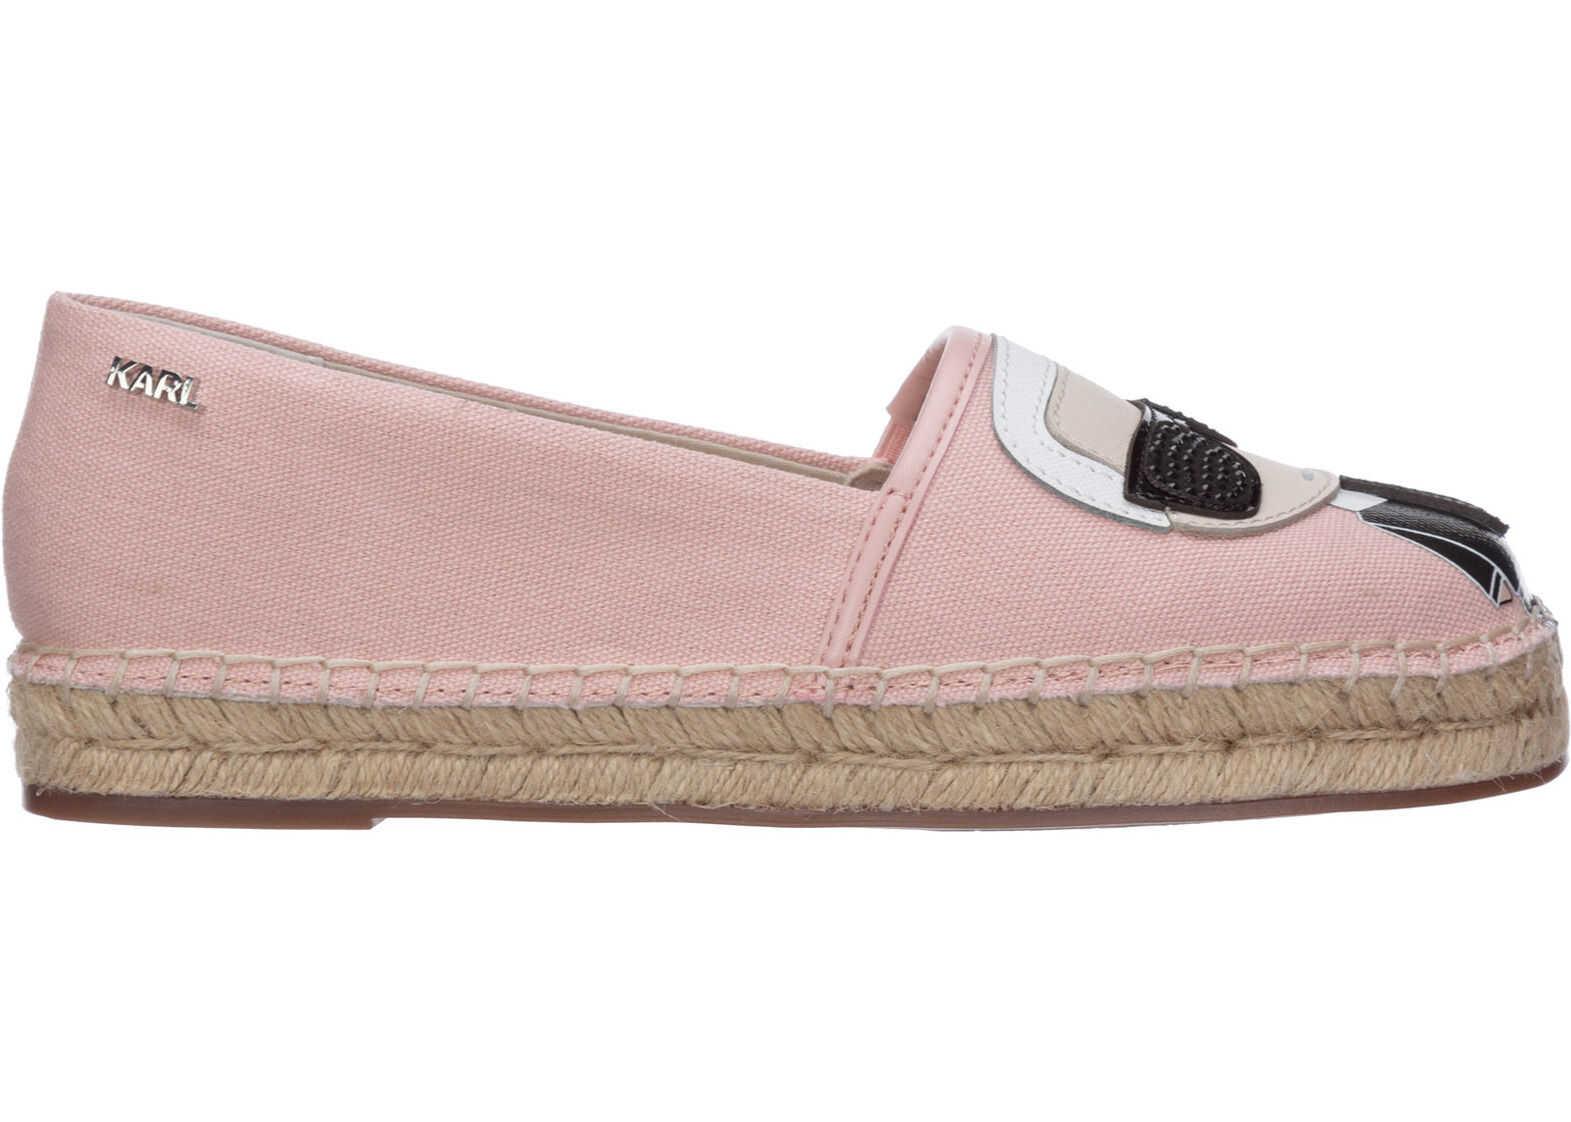 Karl Lagerfeld Cotton Espadrilles Slip On Shoes K/Ikonik Pink